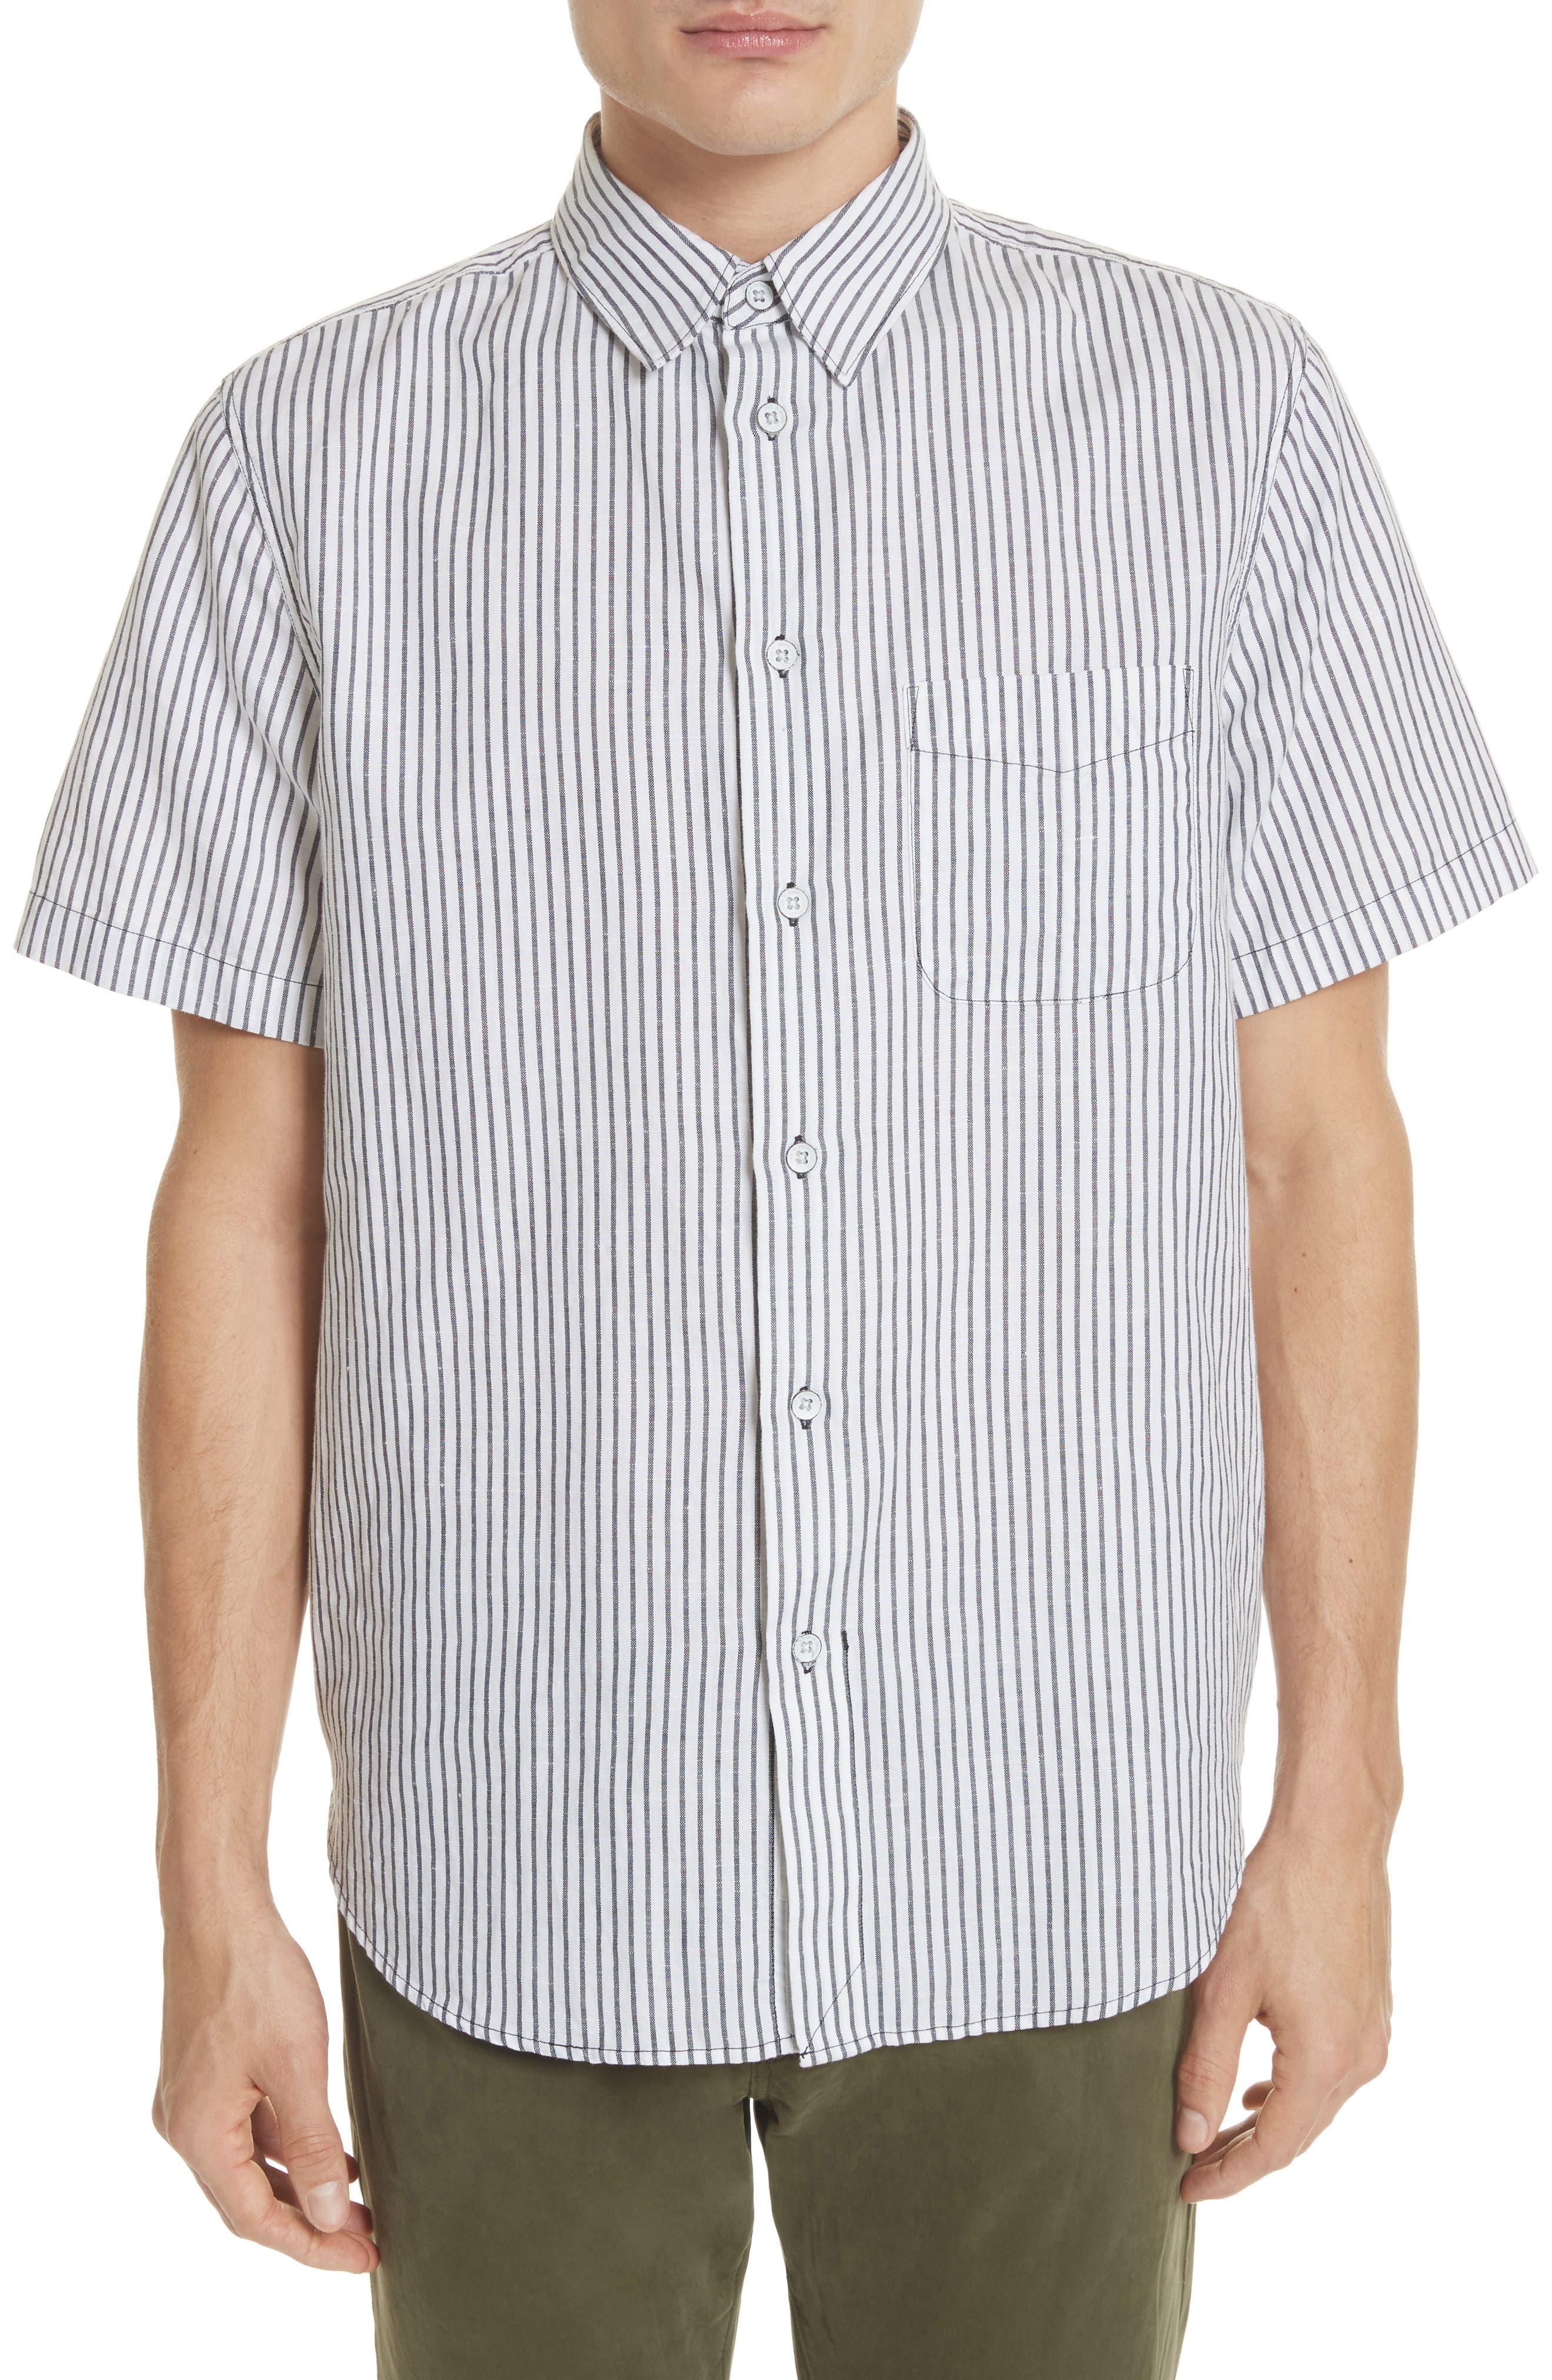 Stripe Short Sleeve Sport Shirt,                             Main thumbnail 1, color,                             195